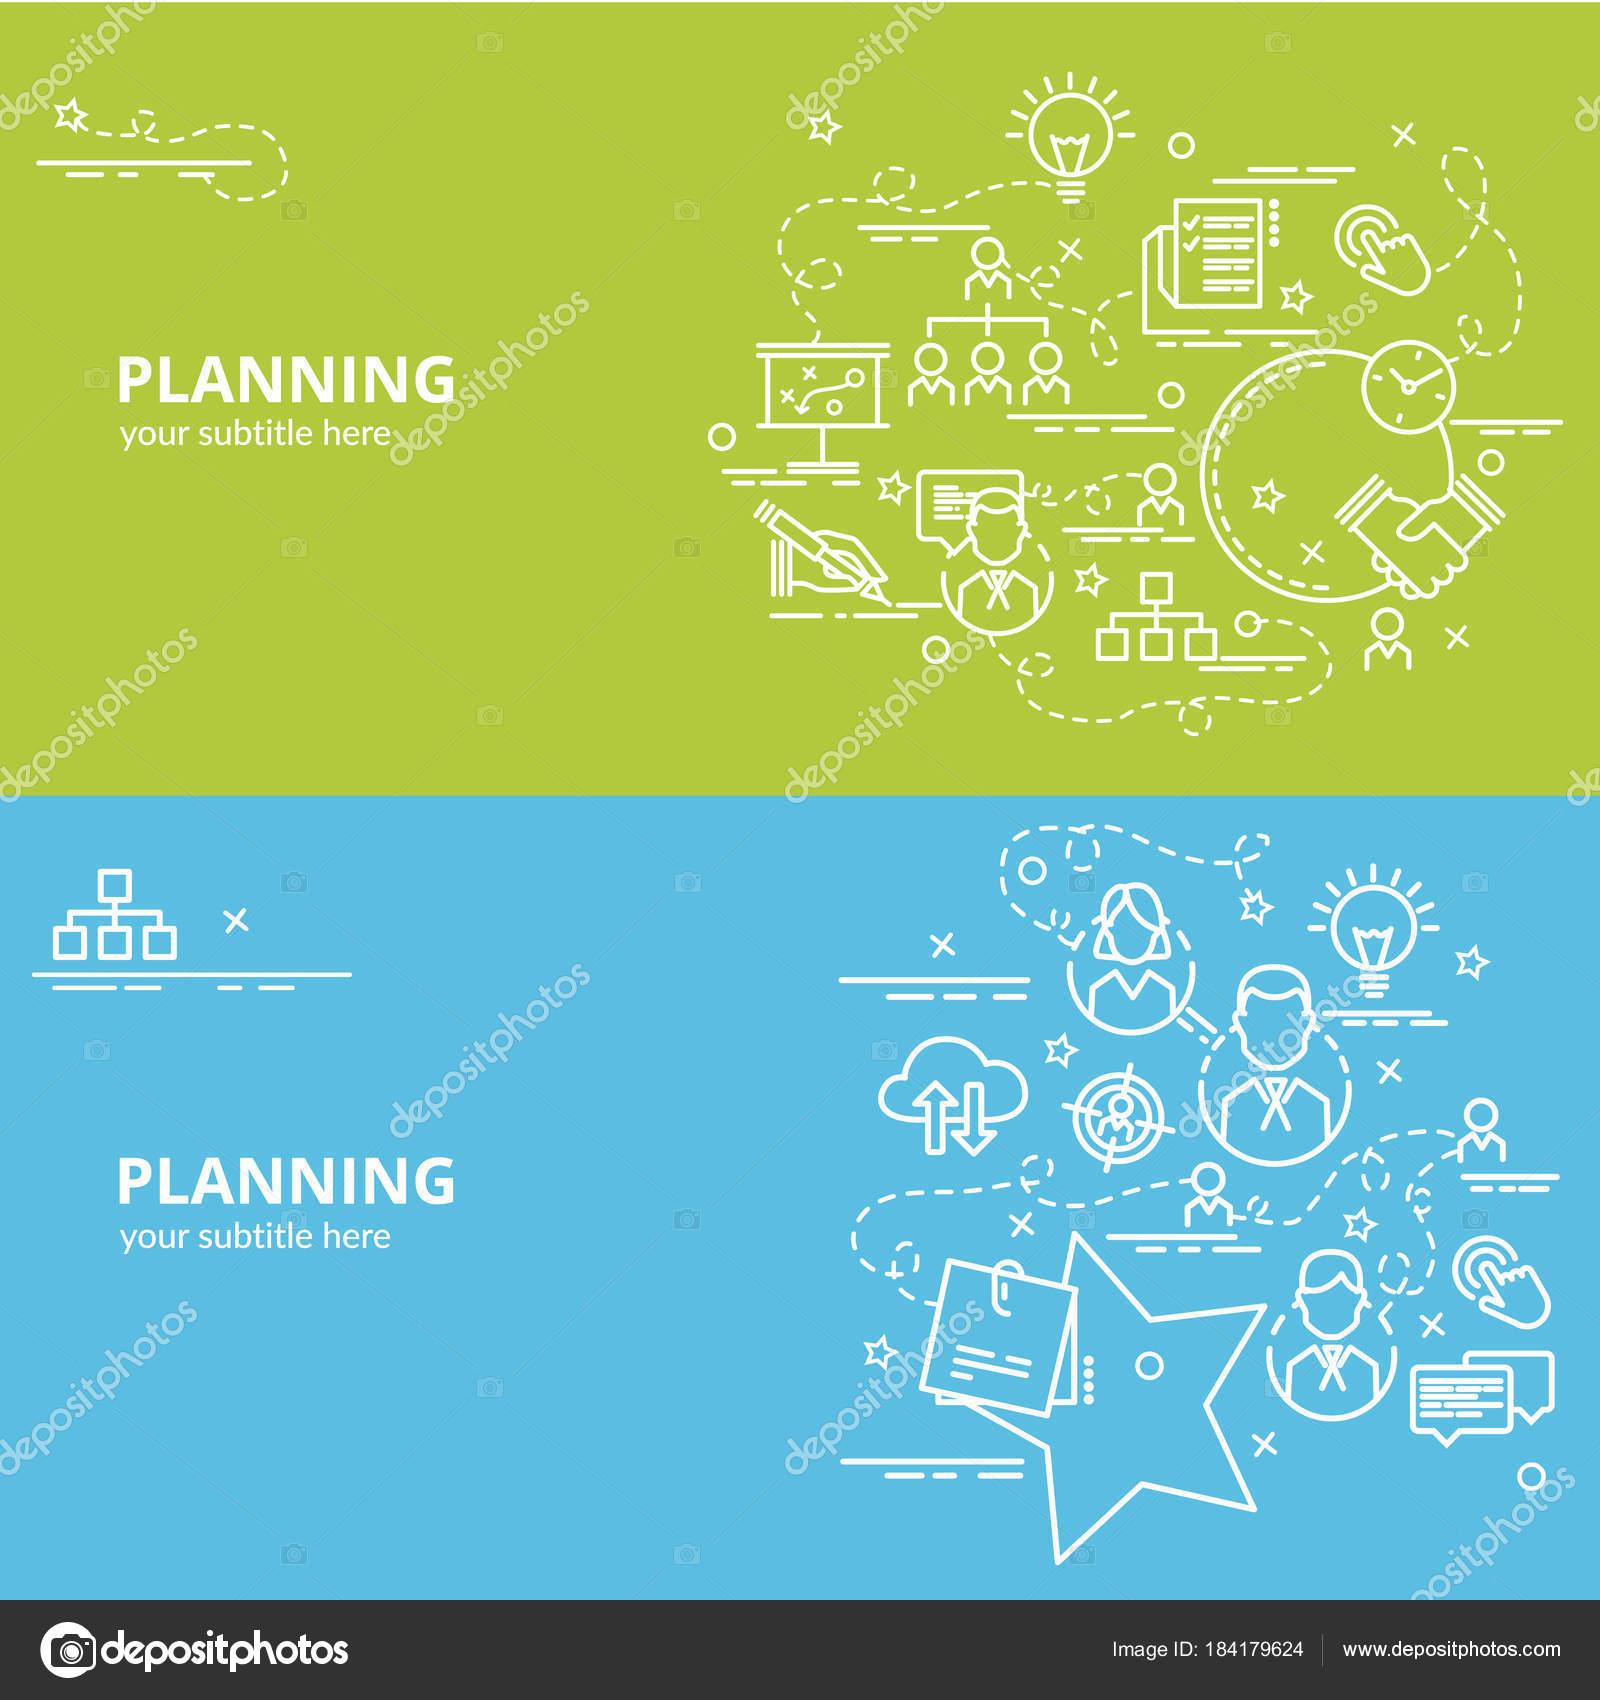 Concepto Diseño Plano Colorido Para Planificación Idea Productos ...